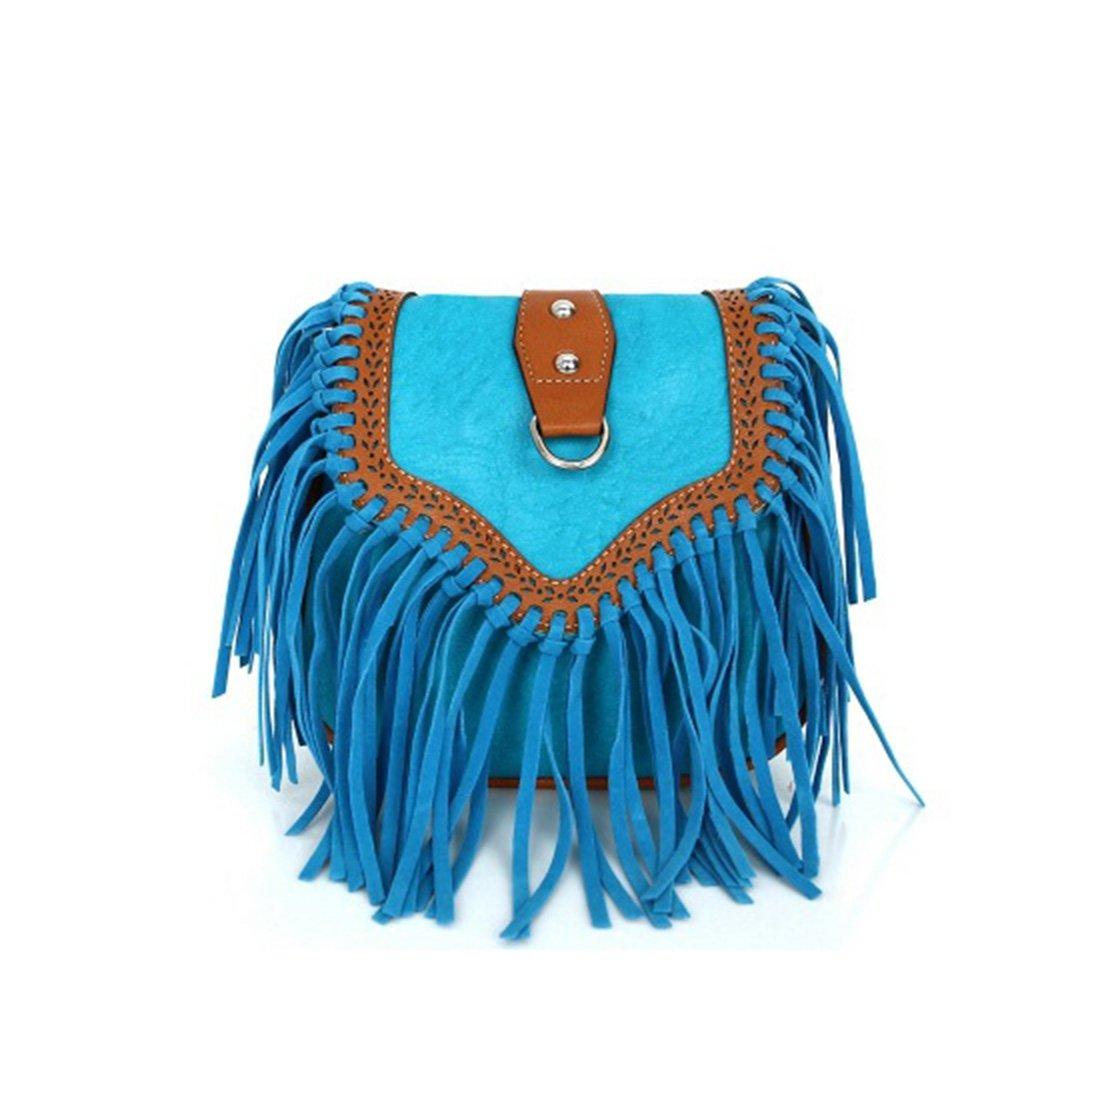 Womens Tassel Shoulder Bag Crossbody Bag Sling Bag Shopping Travel Satchel (Blue)